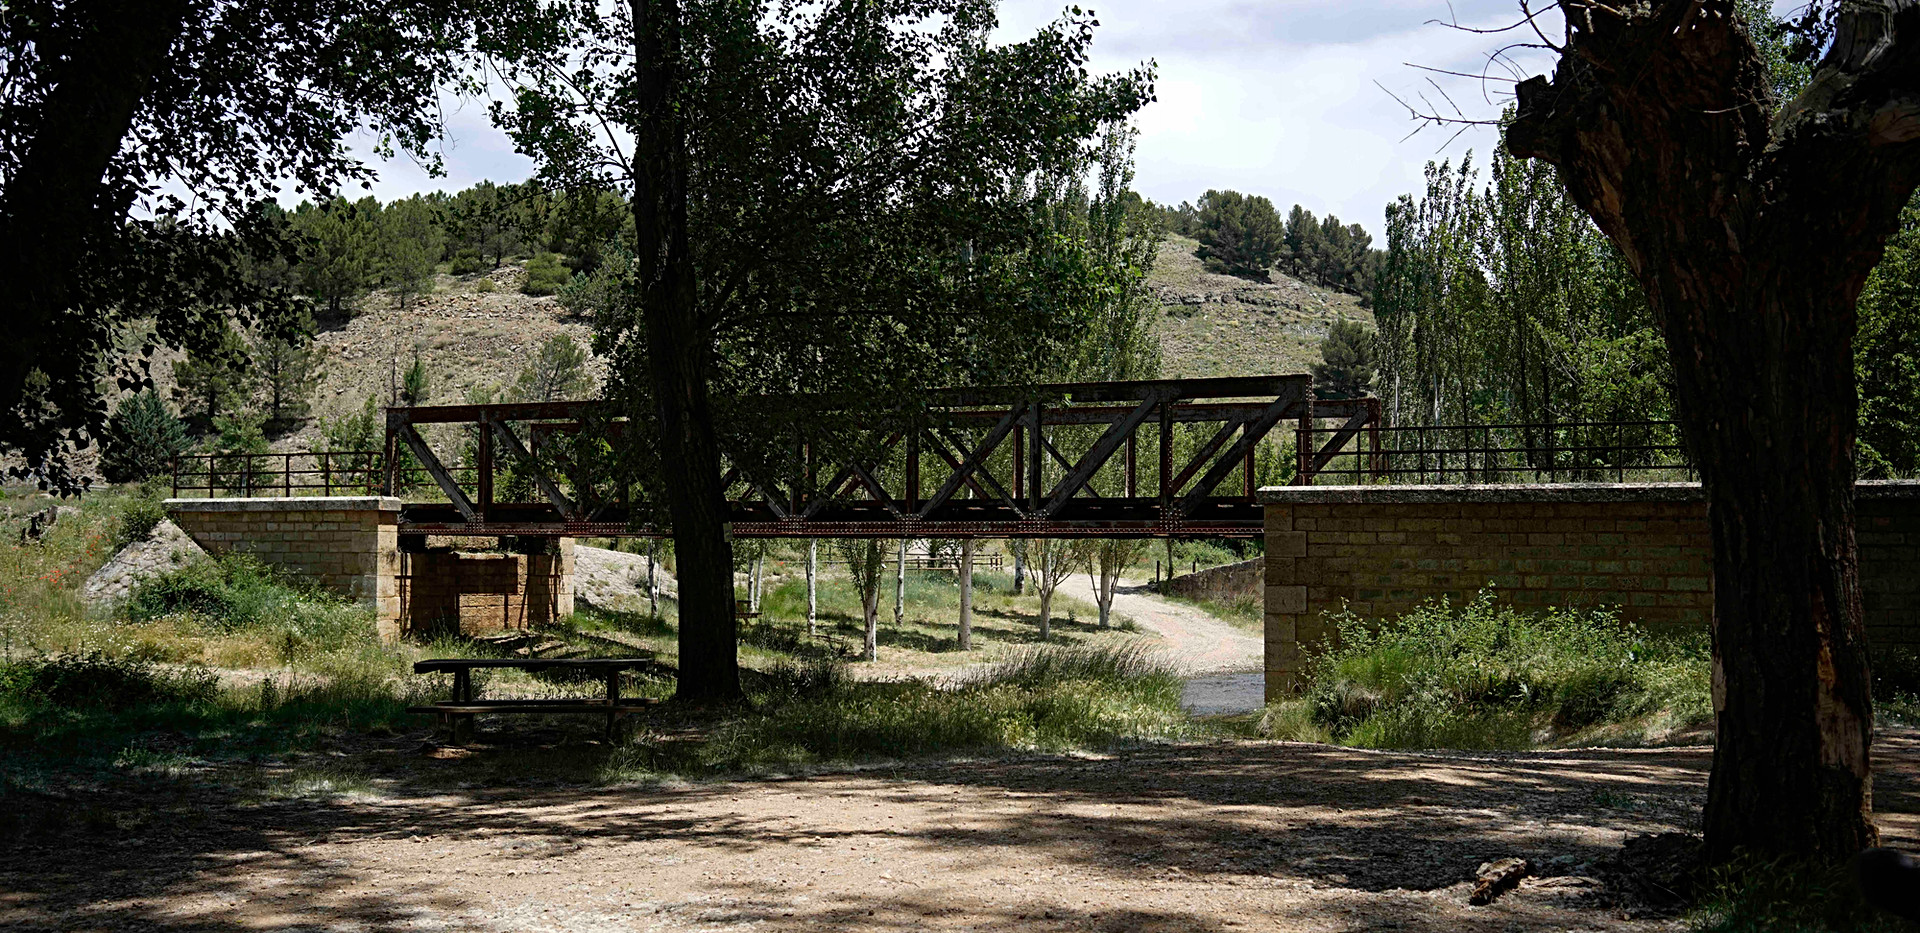 Puente hierro Siglo XX / 20th century iron bridge